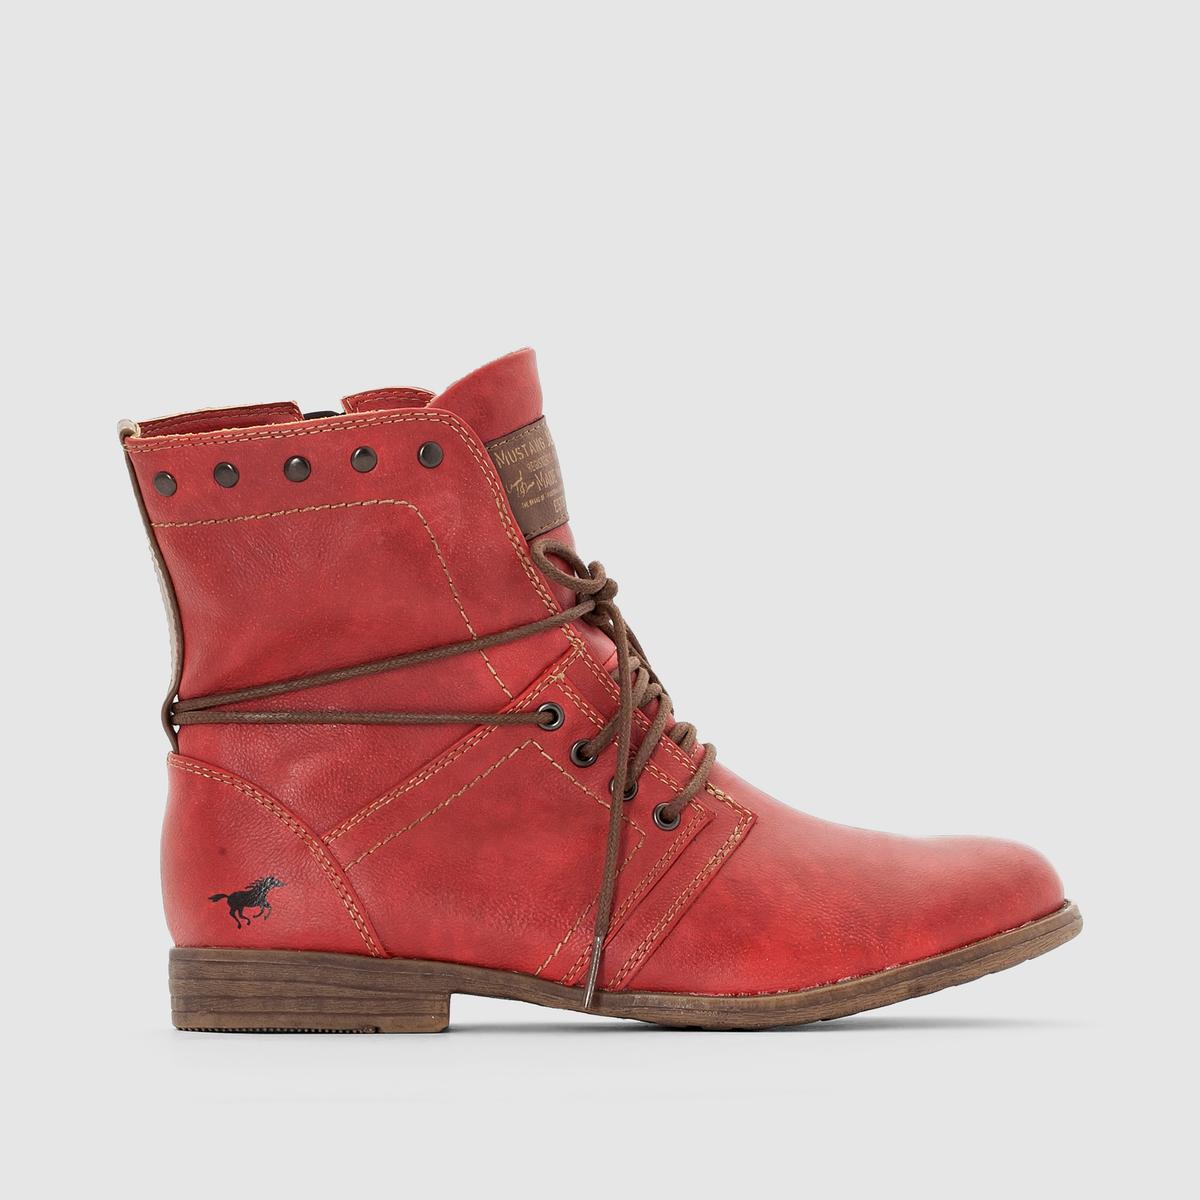 Ботинки на шнуровке от MUSTANG SHOES